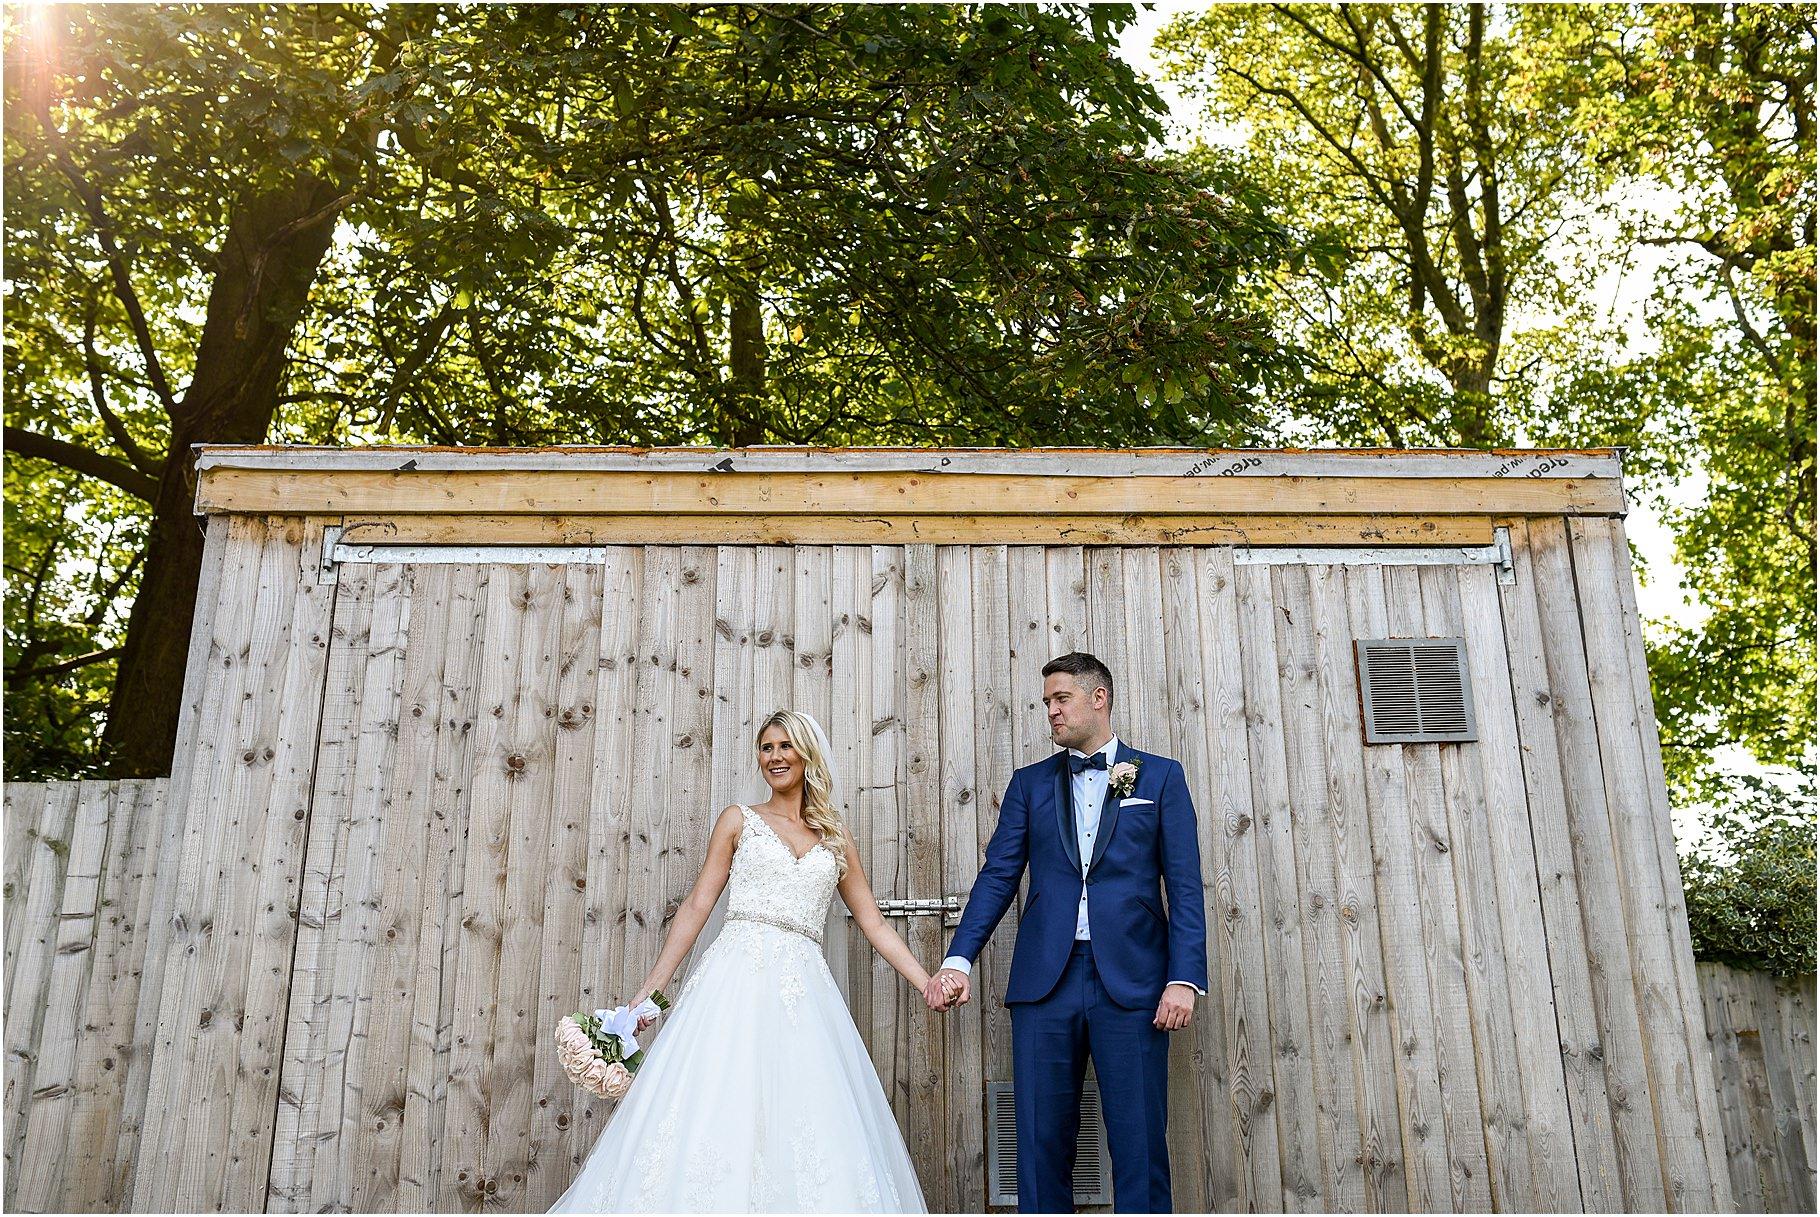 the-villa-wrea-green-wedding-39.jpg